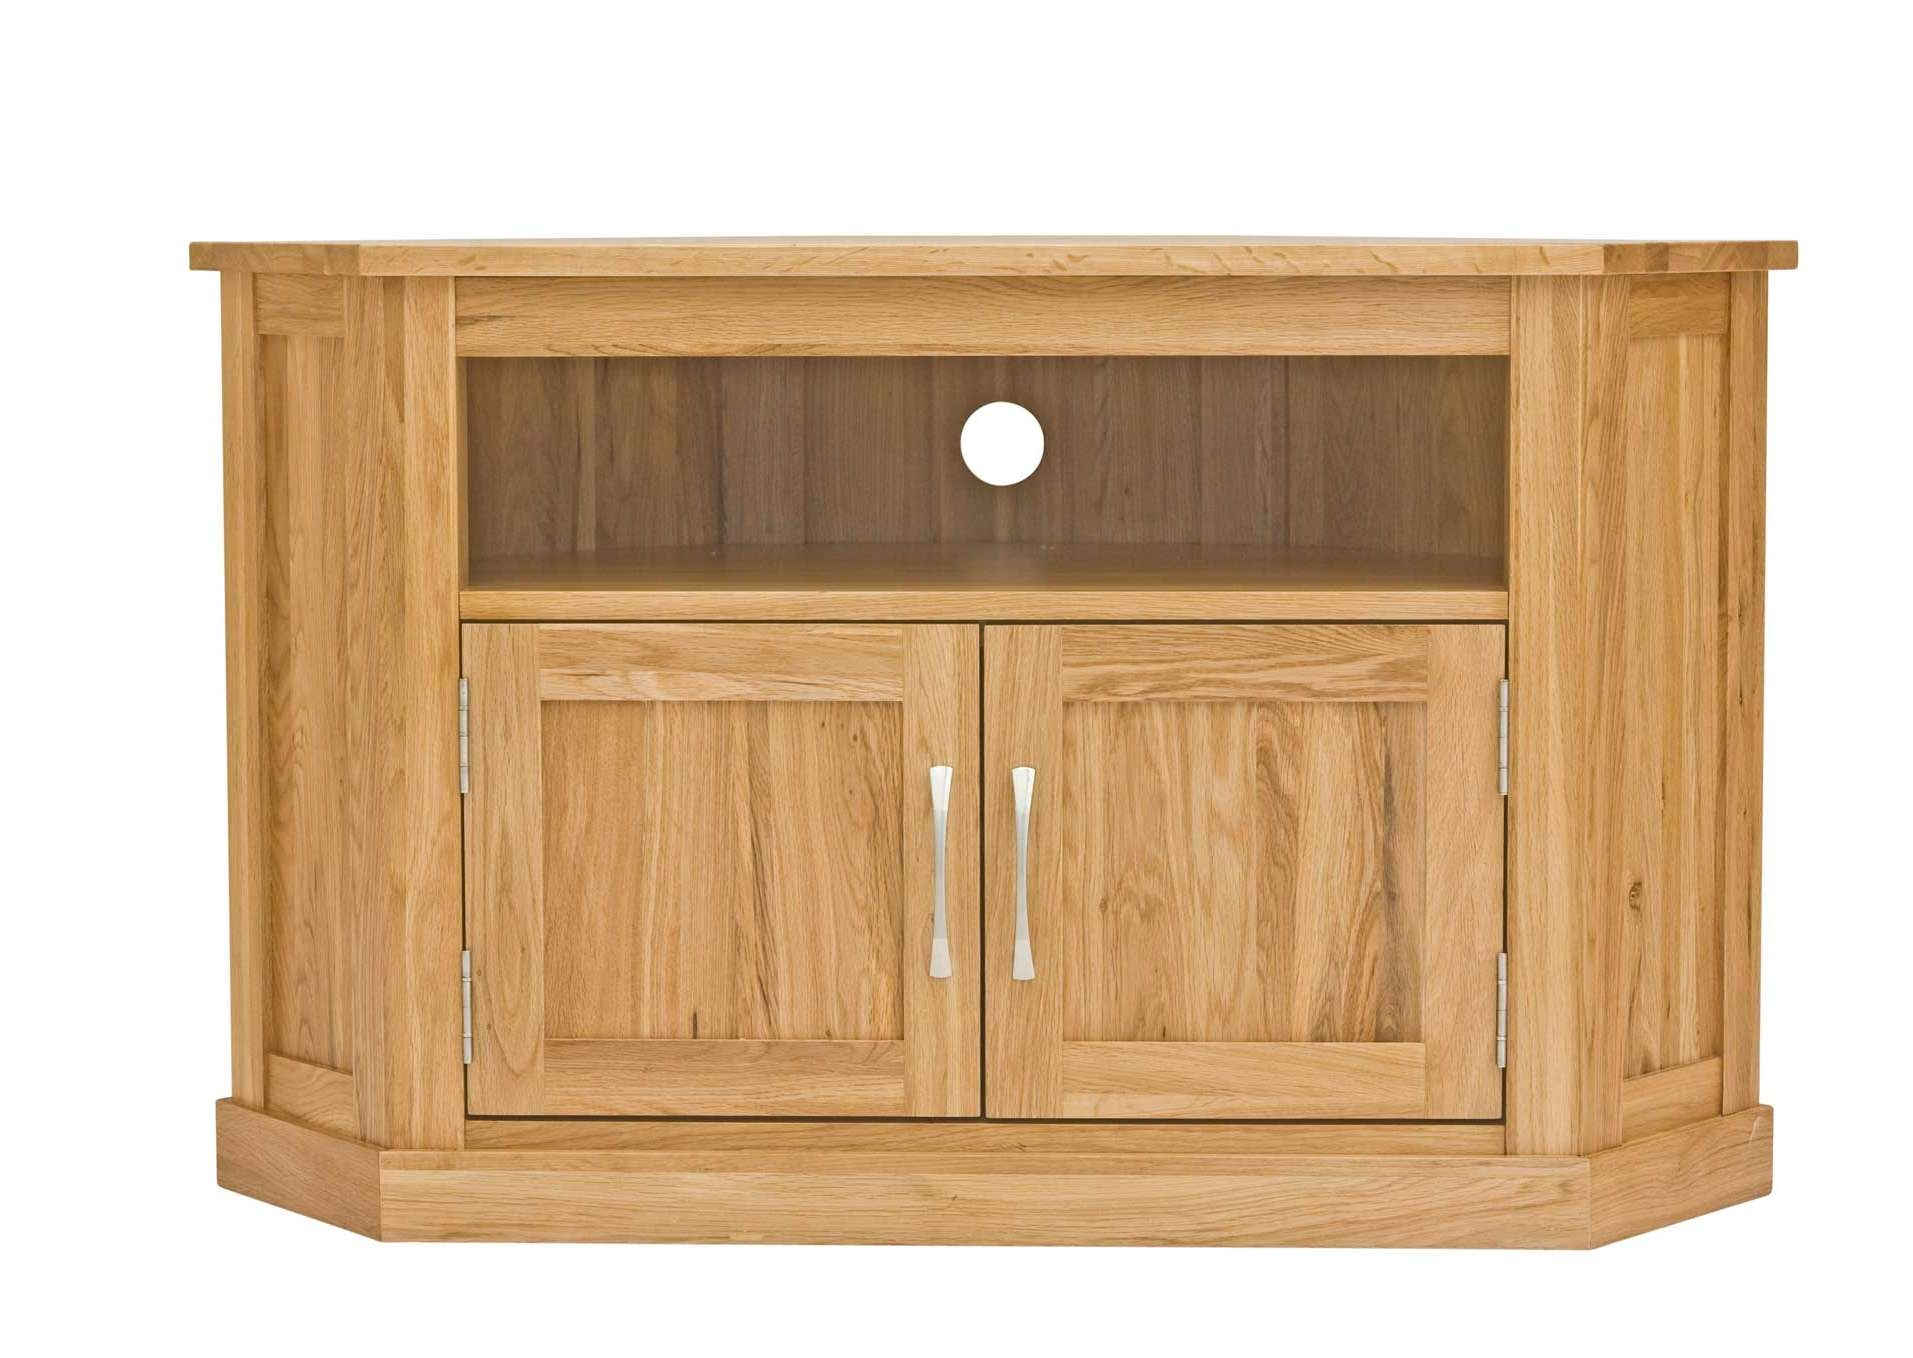 Classic Oak Corner Television Cabinet | Hampshire Furniture With Regard To Solid Oak Corner Tv Cabinets (View 4 of 20)